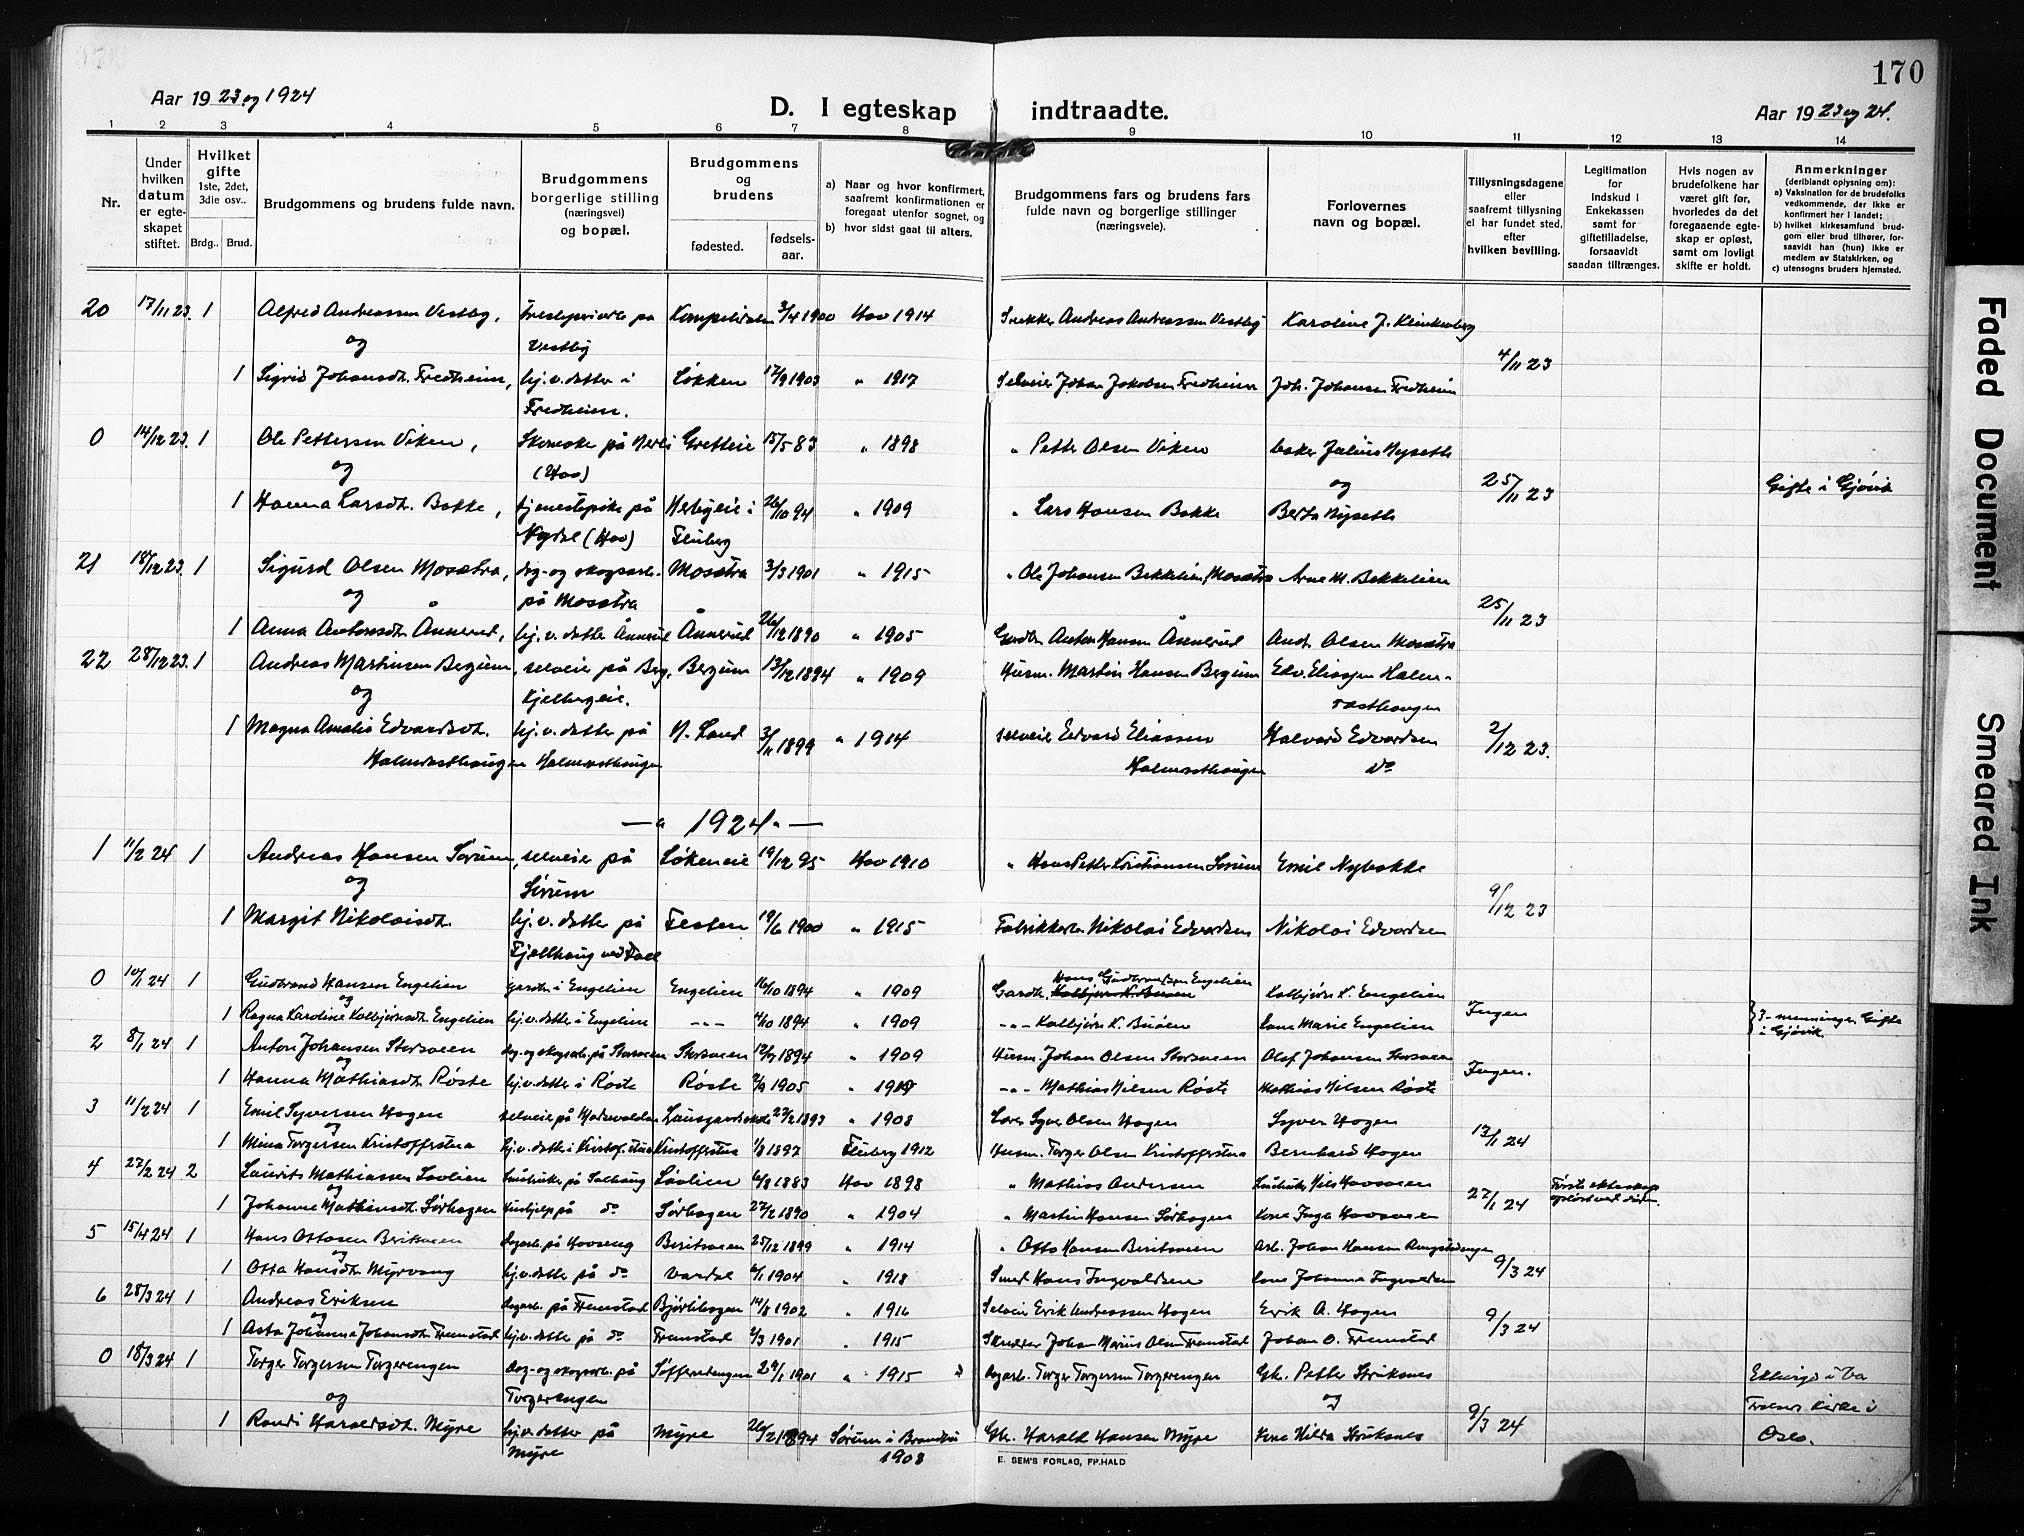 SAH, Søndre Land prestekontor, L/L0007: Klokkerbok nr. 7, 1915-1932, s. 170